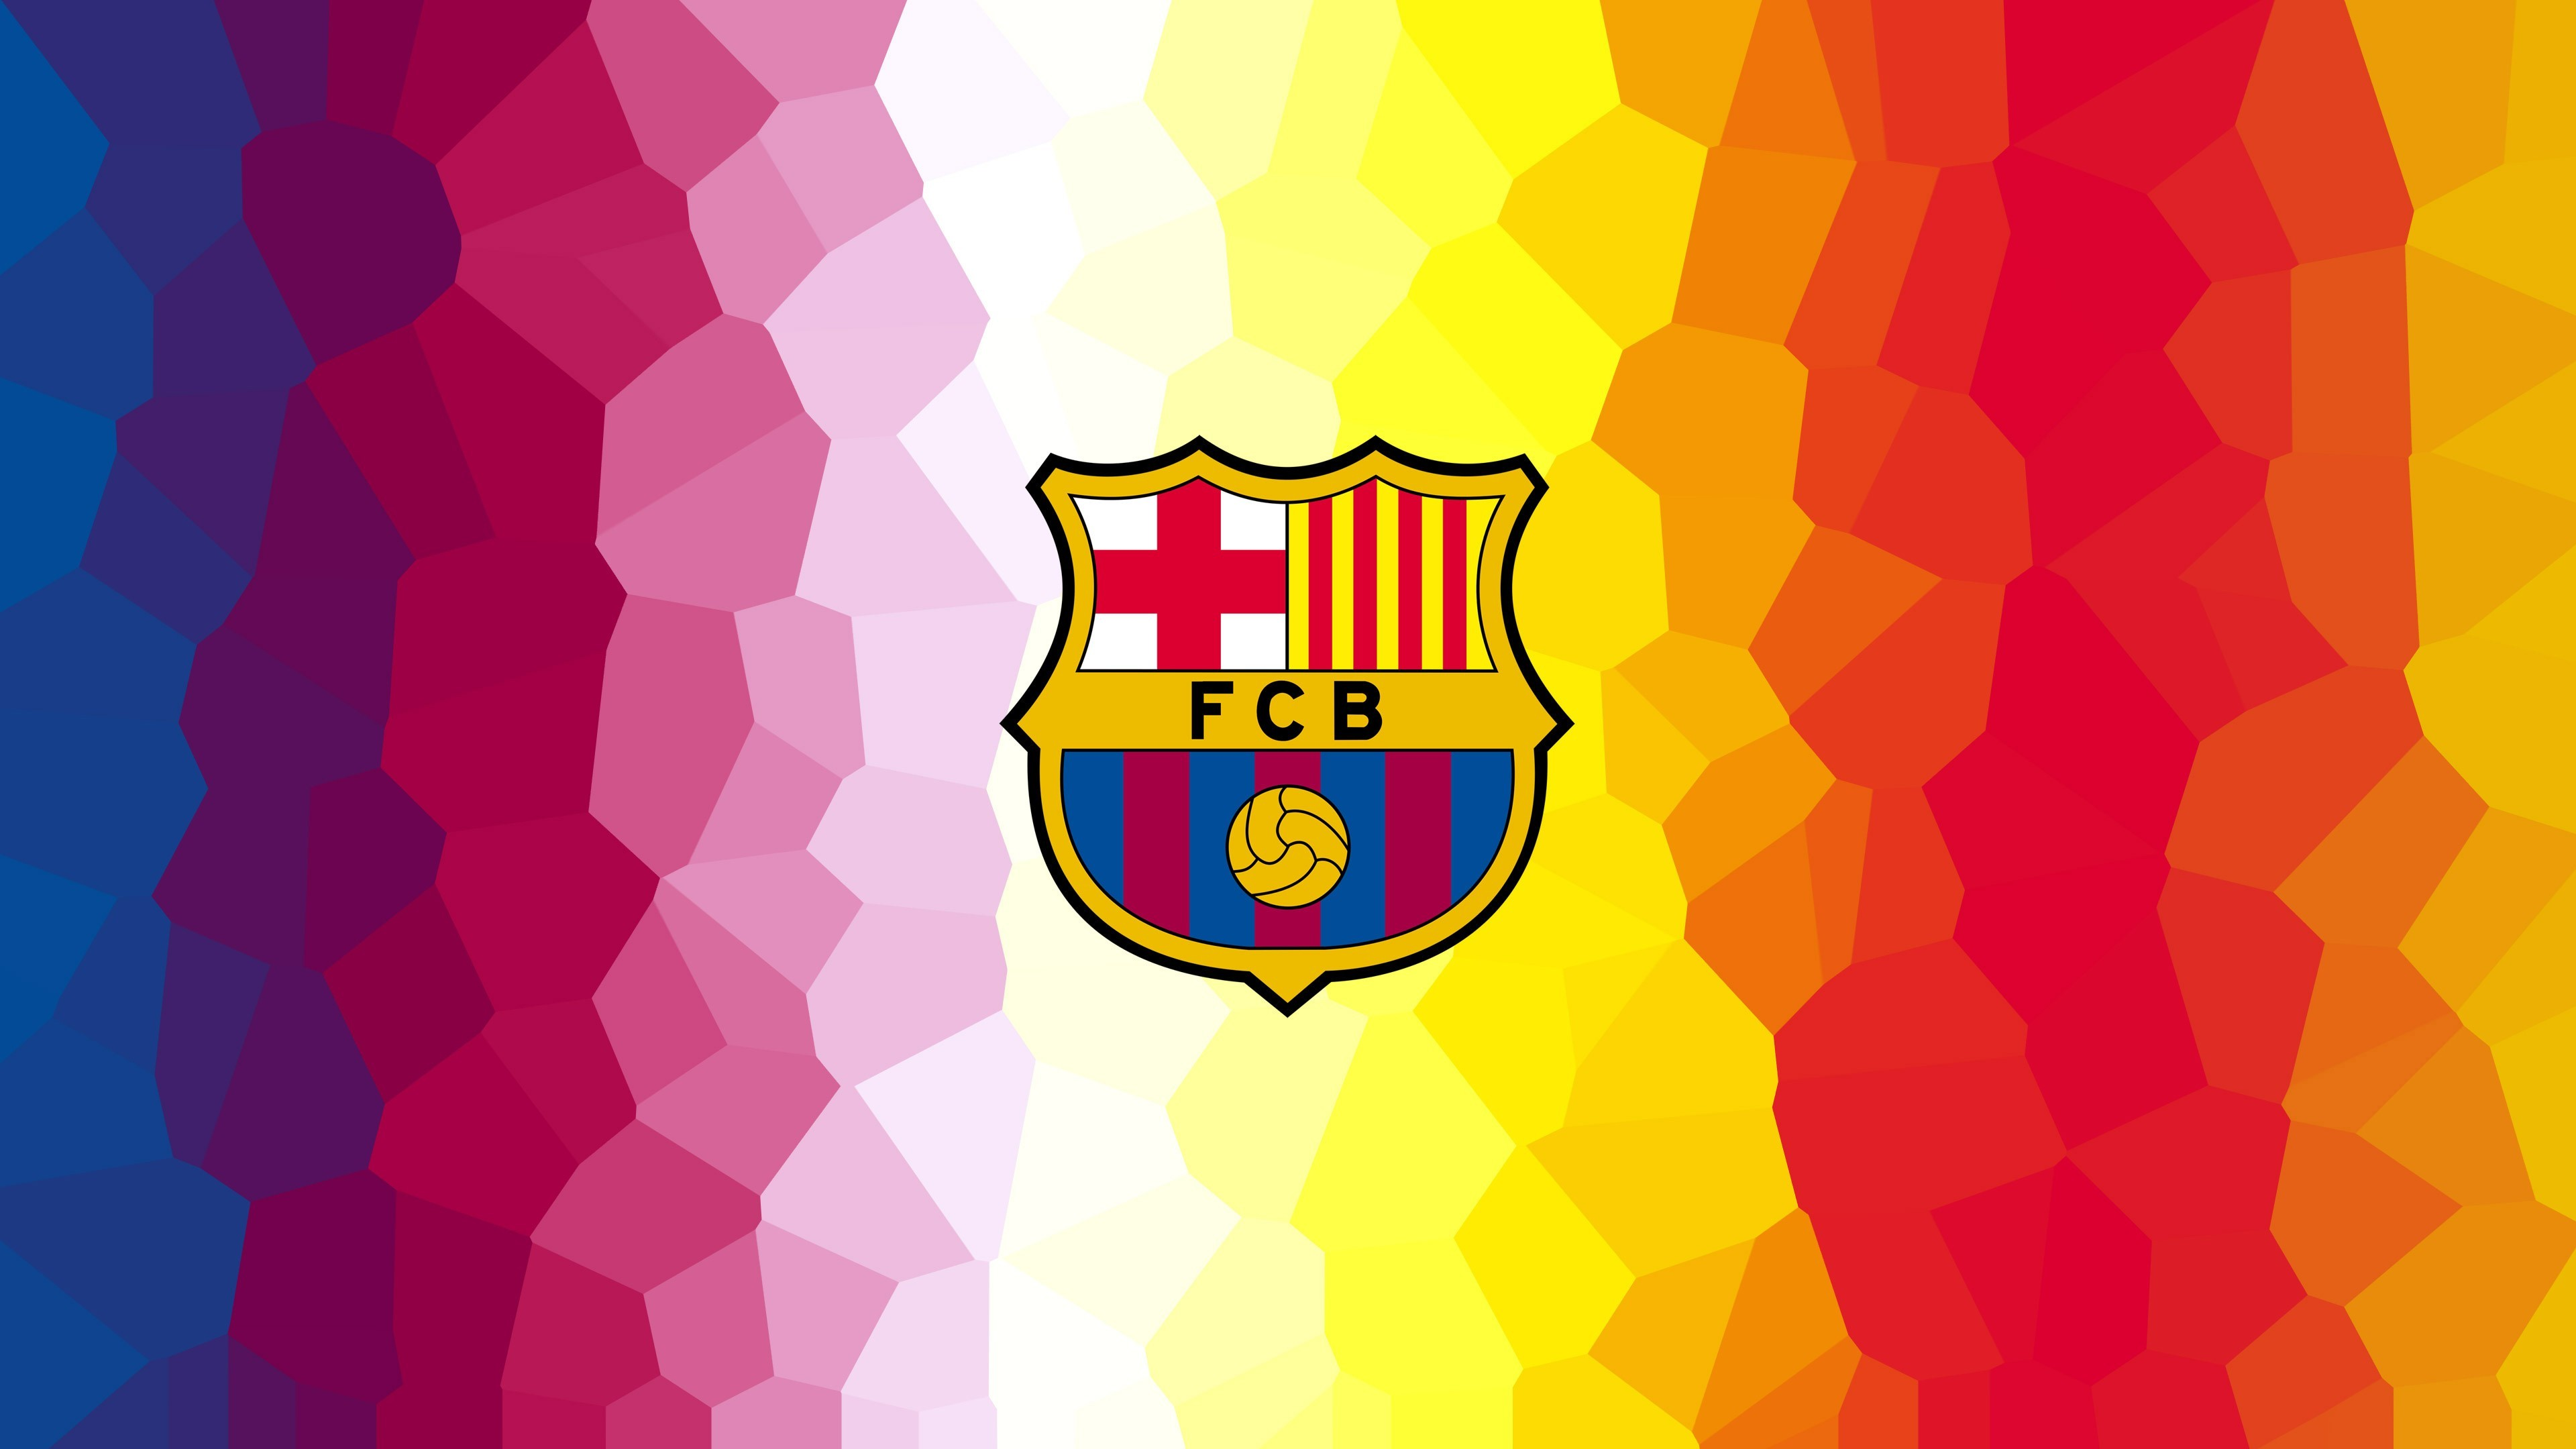 fc barcelona wallpaper hd